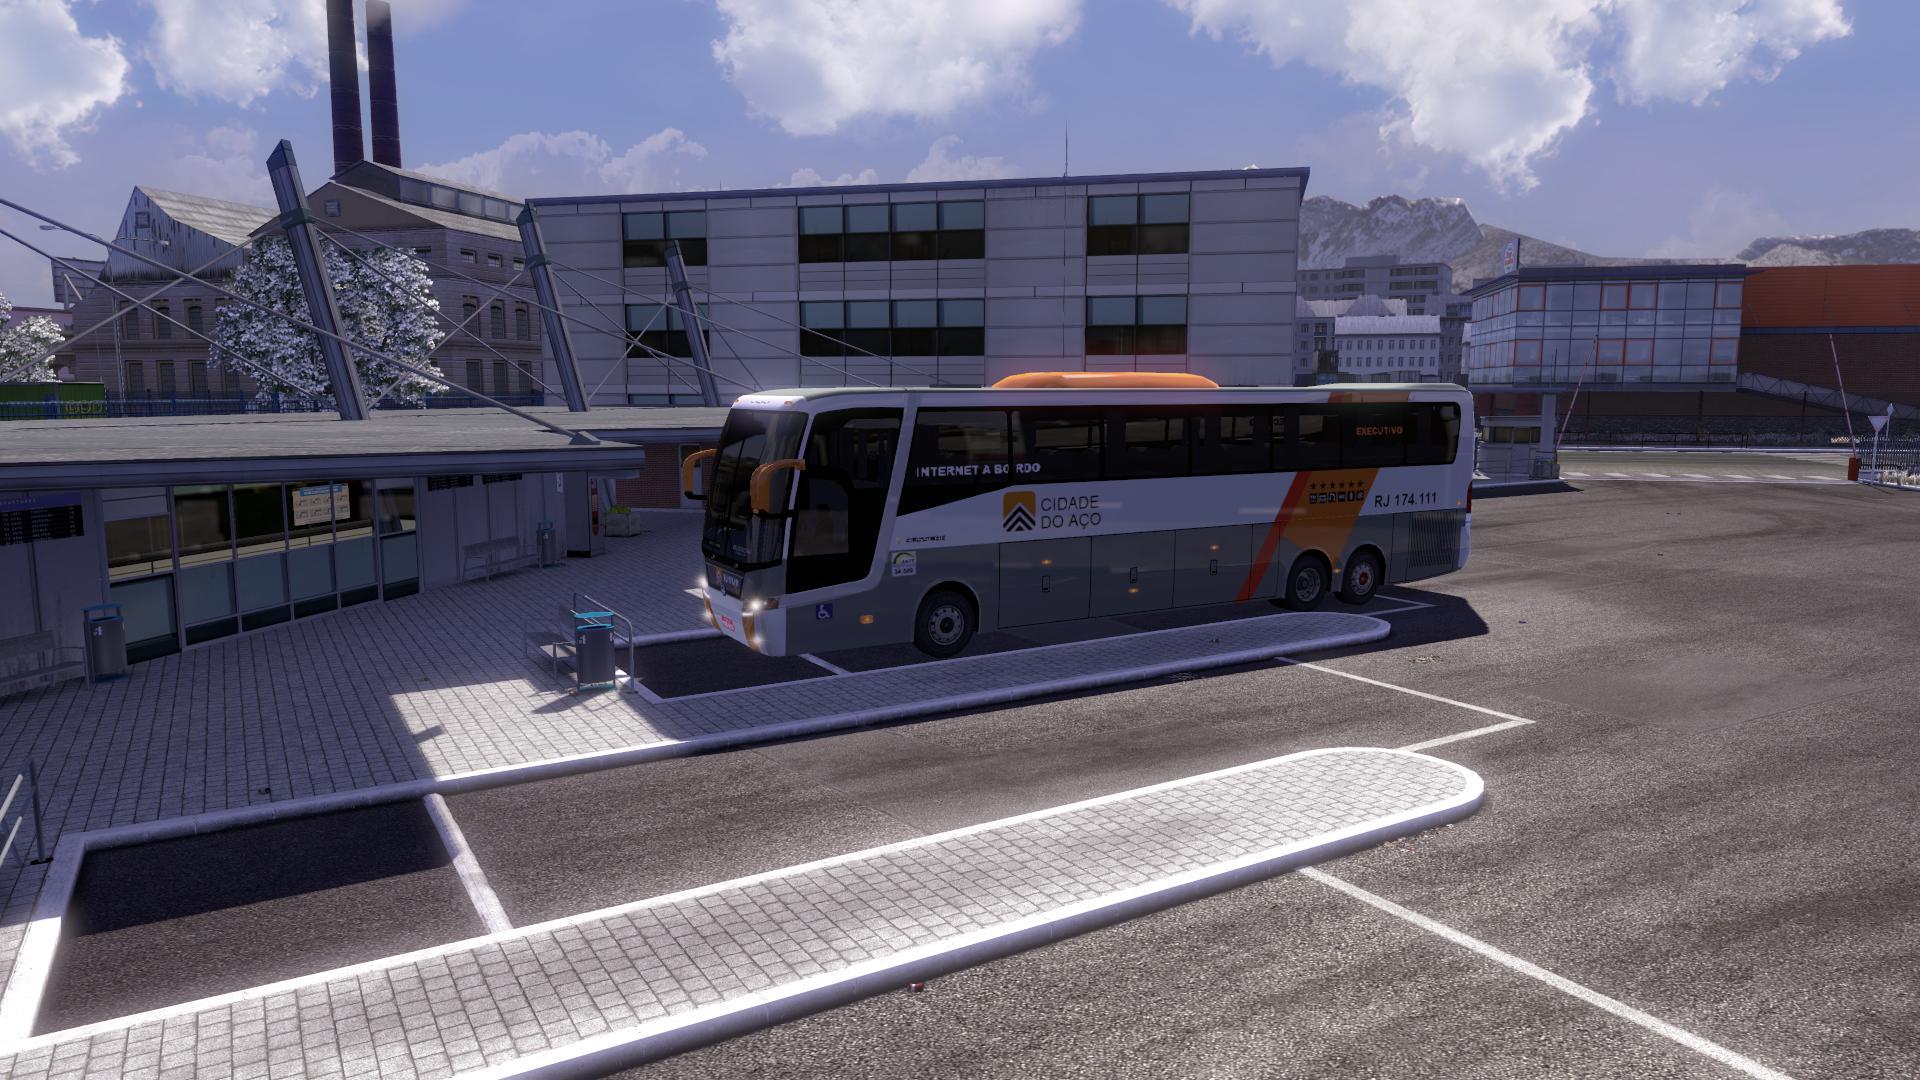 Elegance 360 + Mod Passengers v2 1 - Modhub us